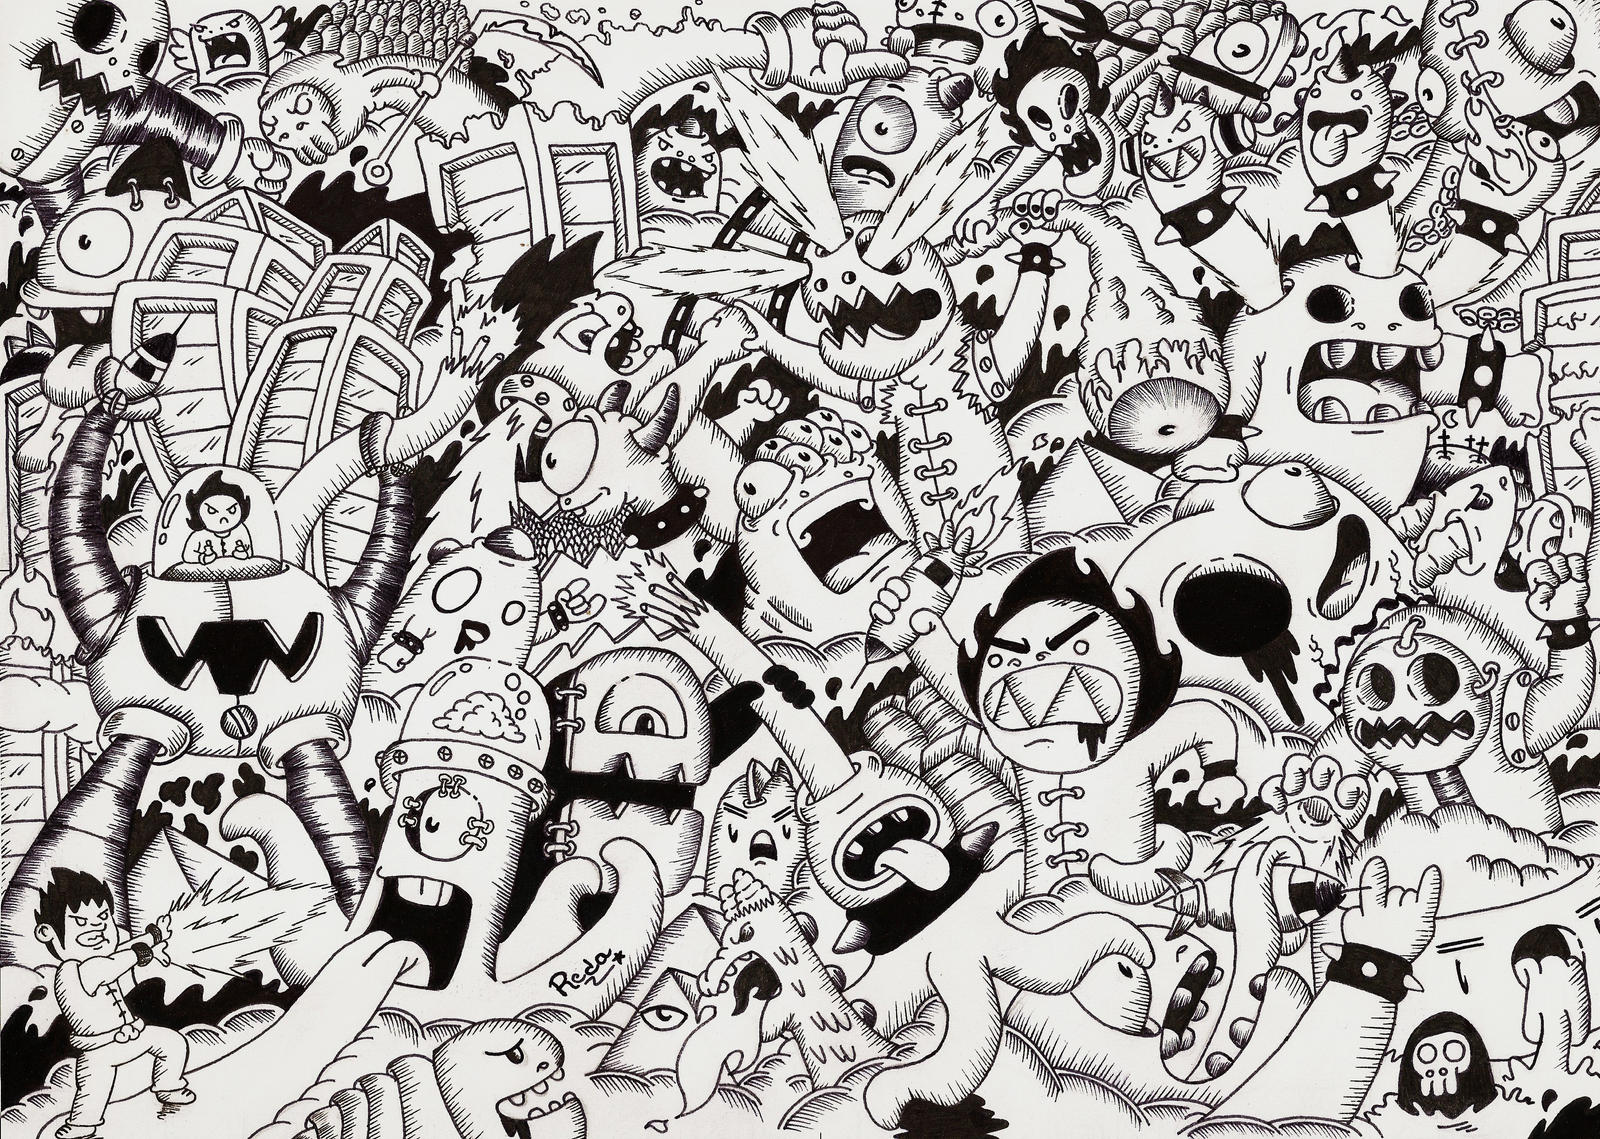 Doodle war by RedStar9...